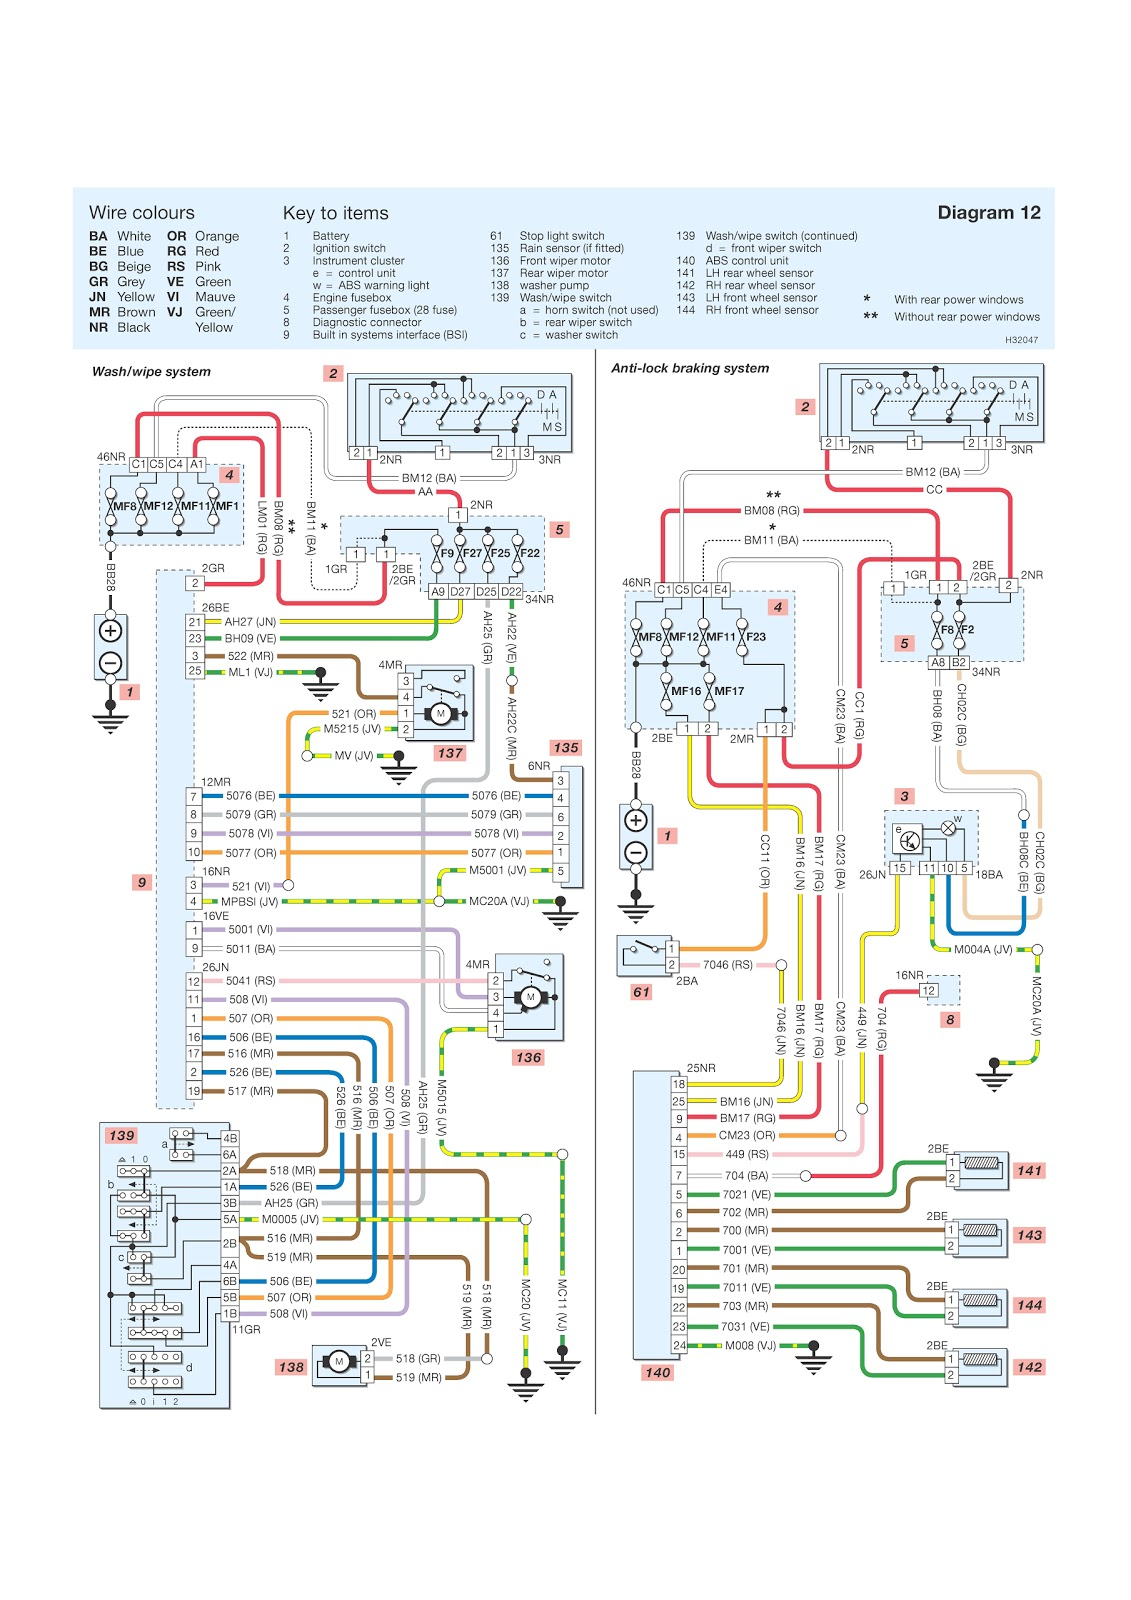 peugeot ac wiring diagram ac maintaining septic system diagram, Wiring diagram